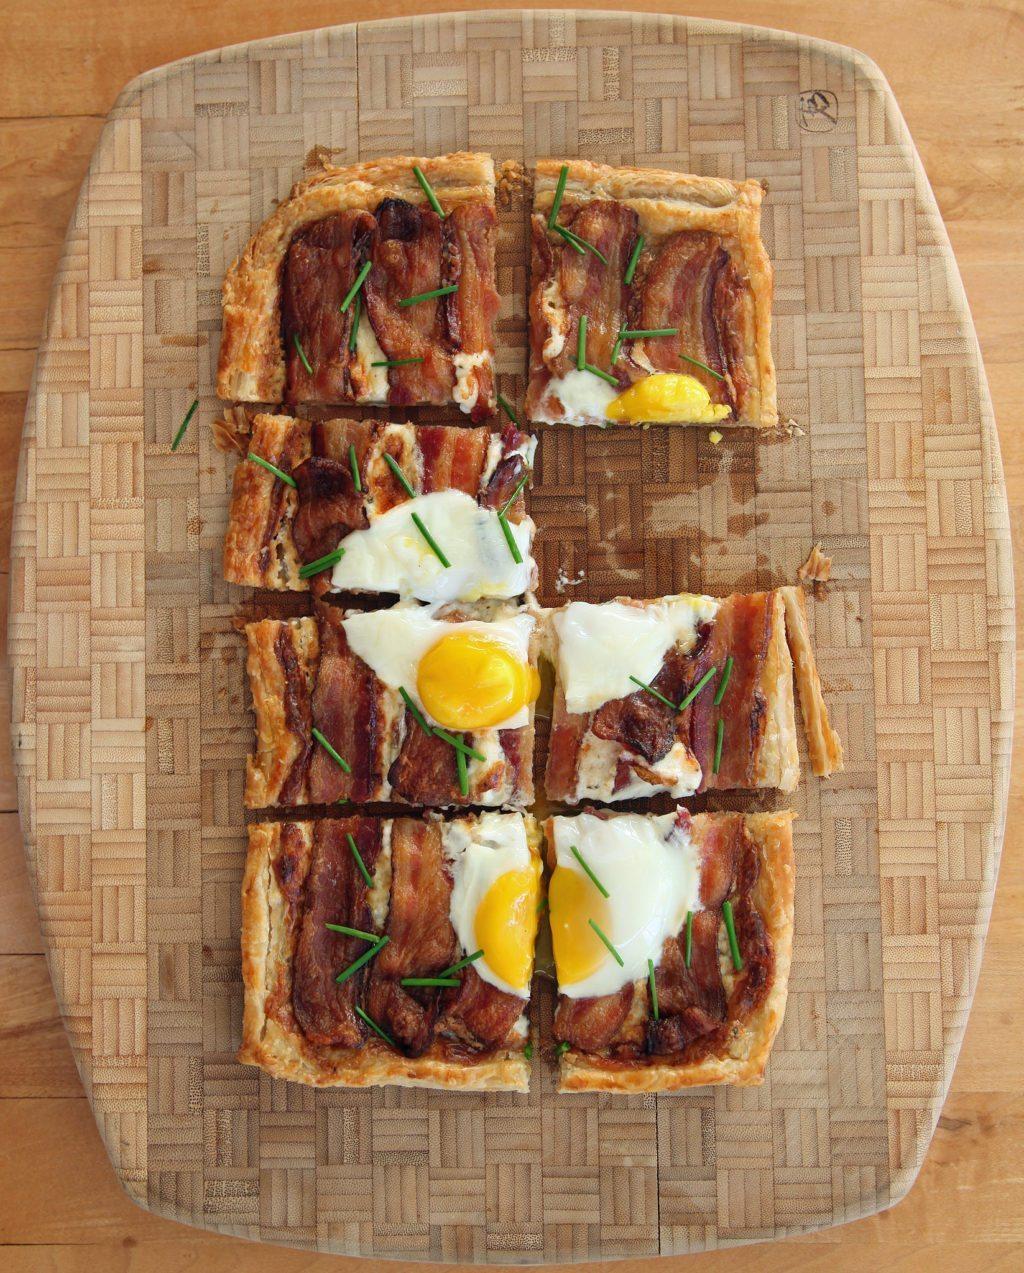 bc4adab6d85ba1eb_Bacon-and-Egg-Tart.xxxlarge_2x